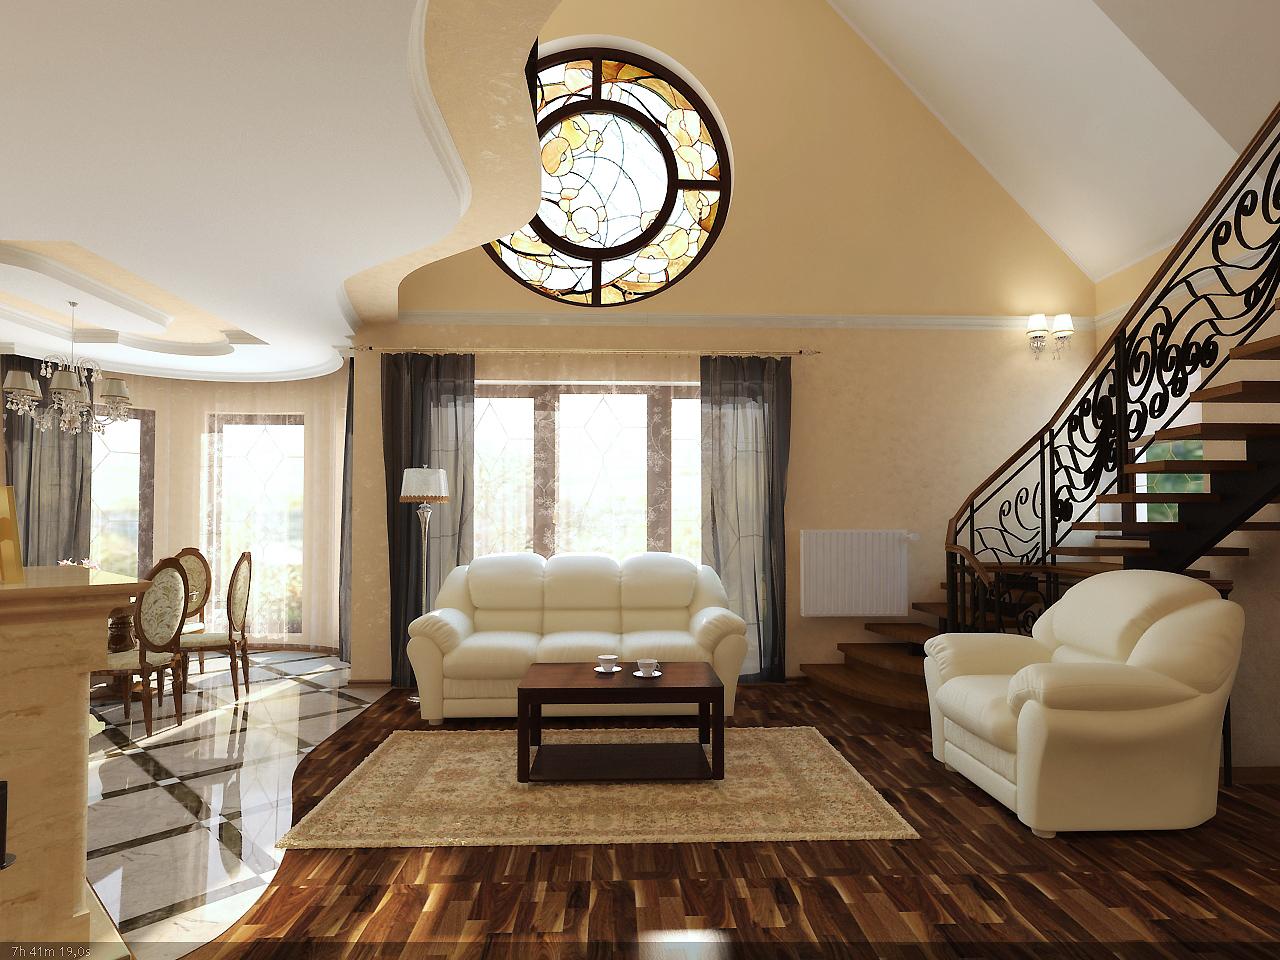 interior-cool-beige-living-room-home-interior-decorating-with-classical-furniture-ideas-principles-of-interior-design